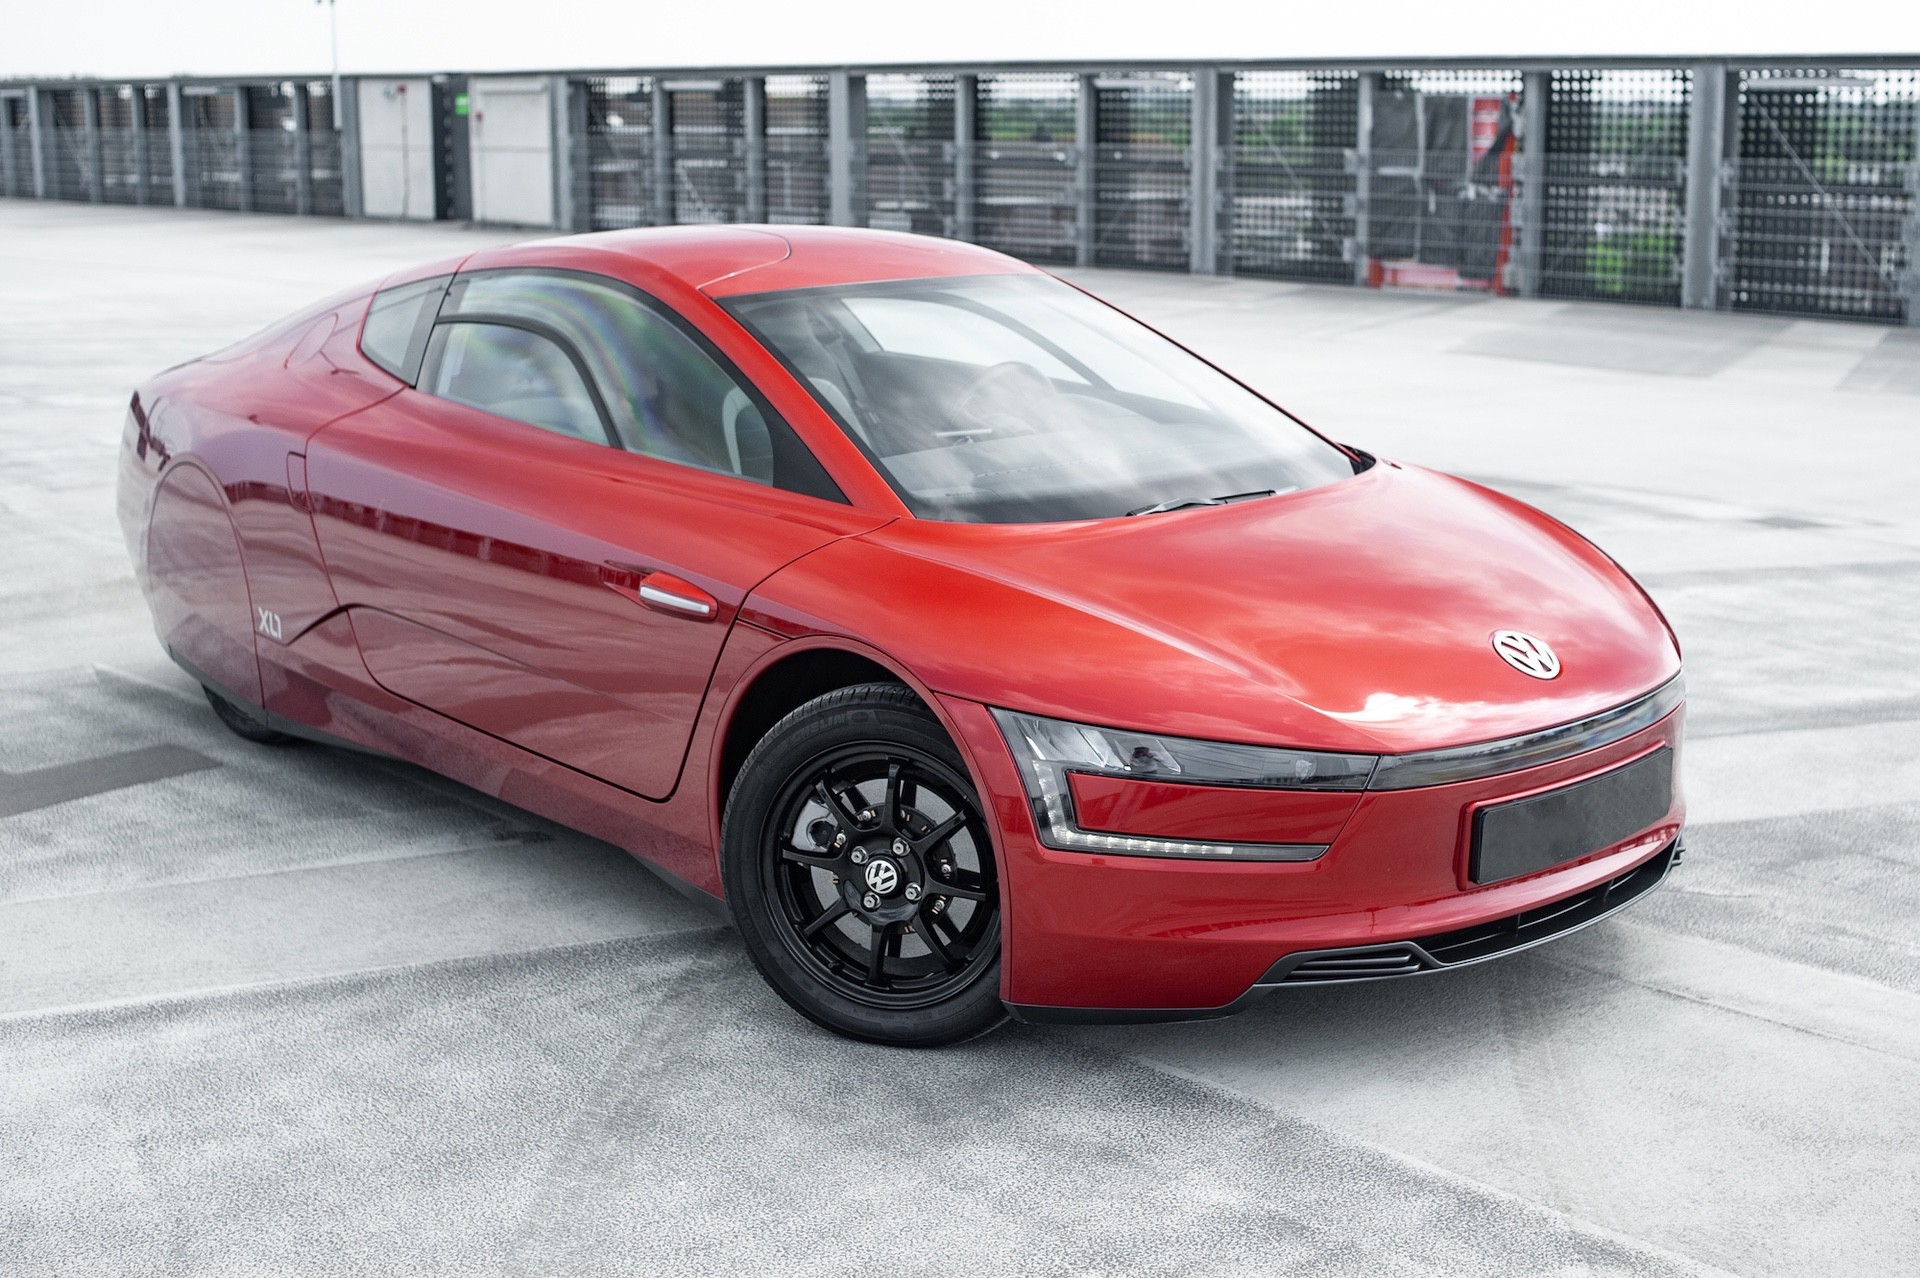 Volkswagen_XL1_sale-0032